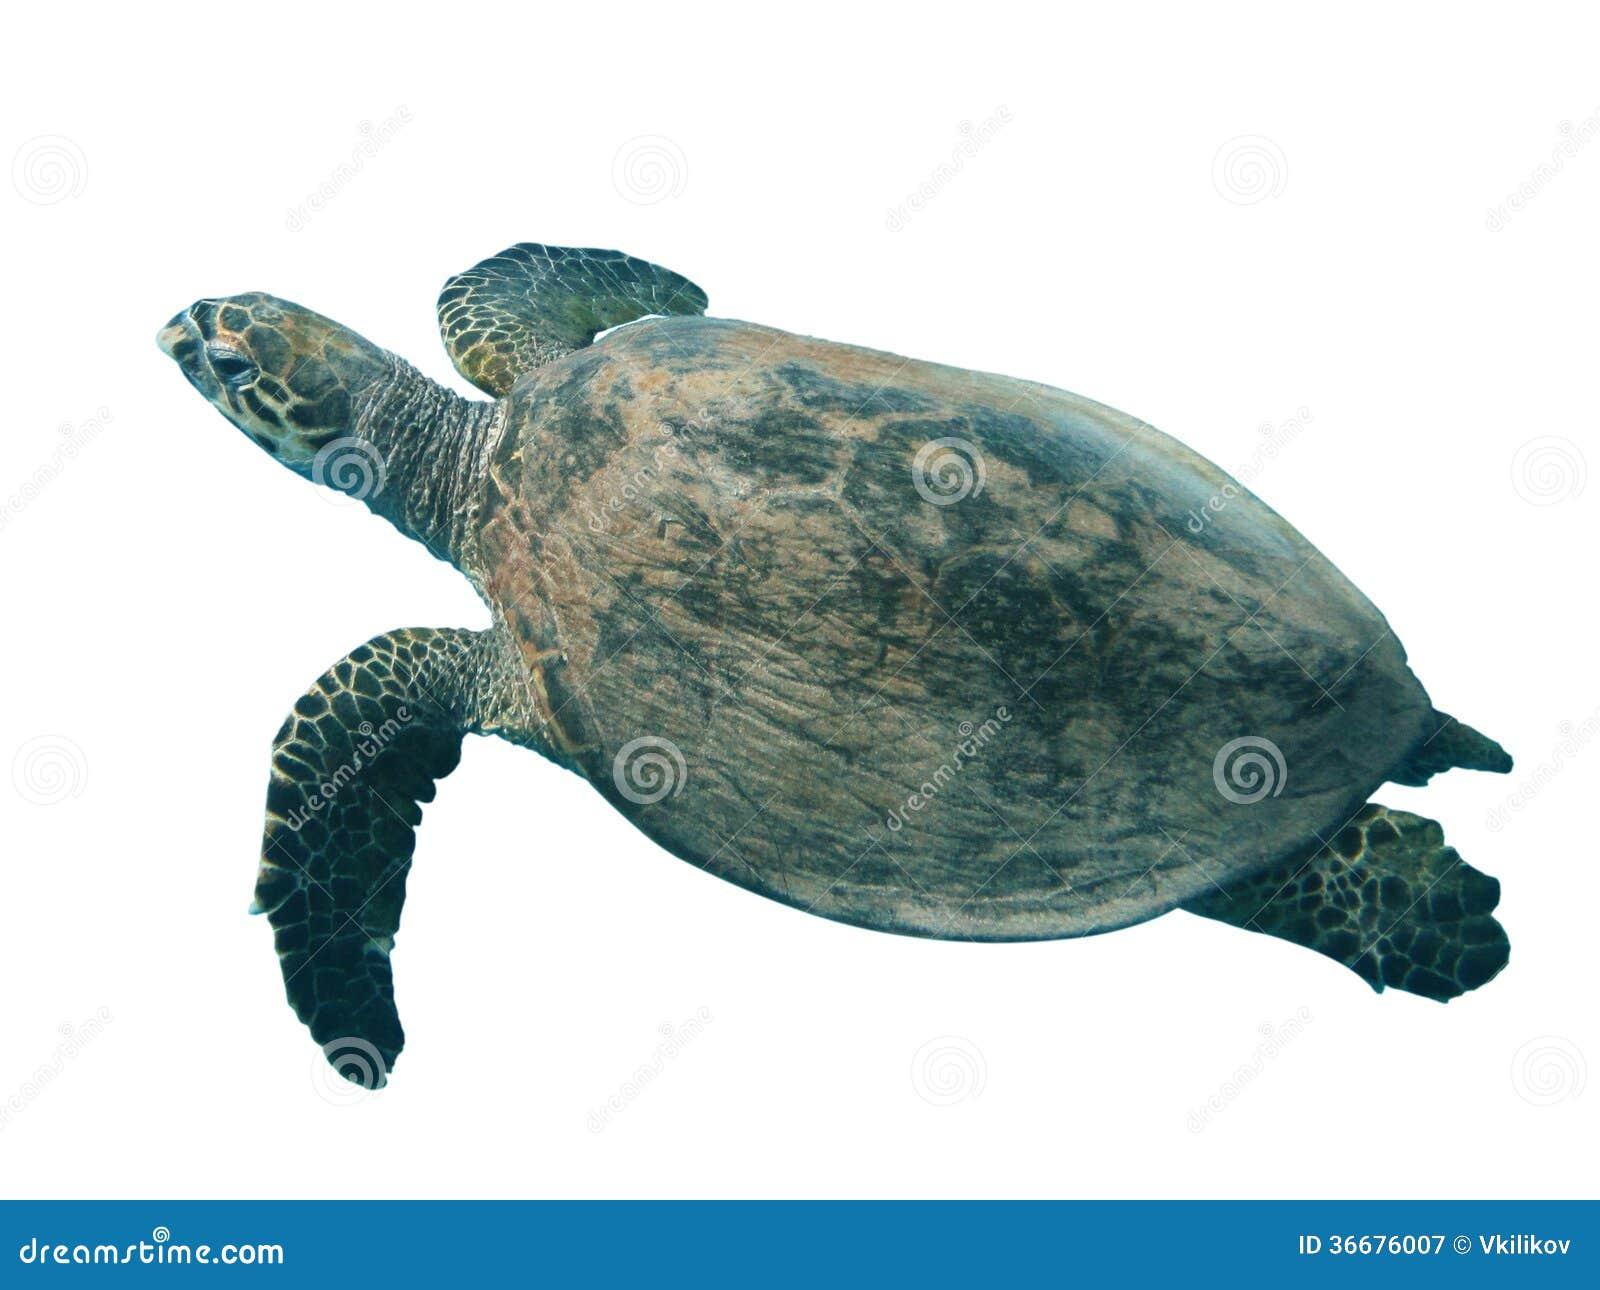 turtle white background - photo #18